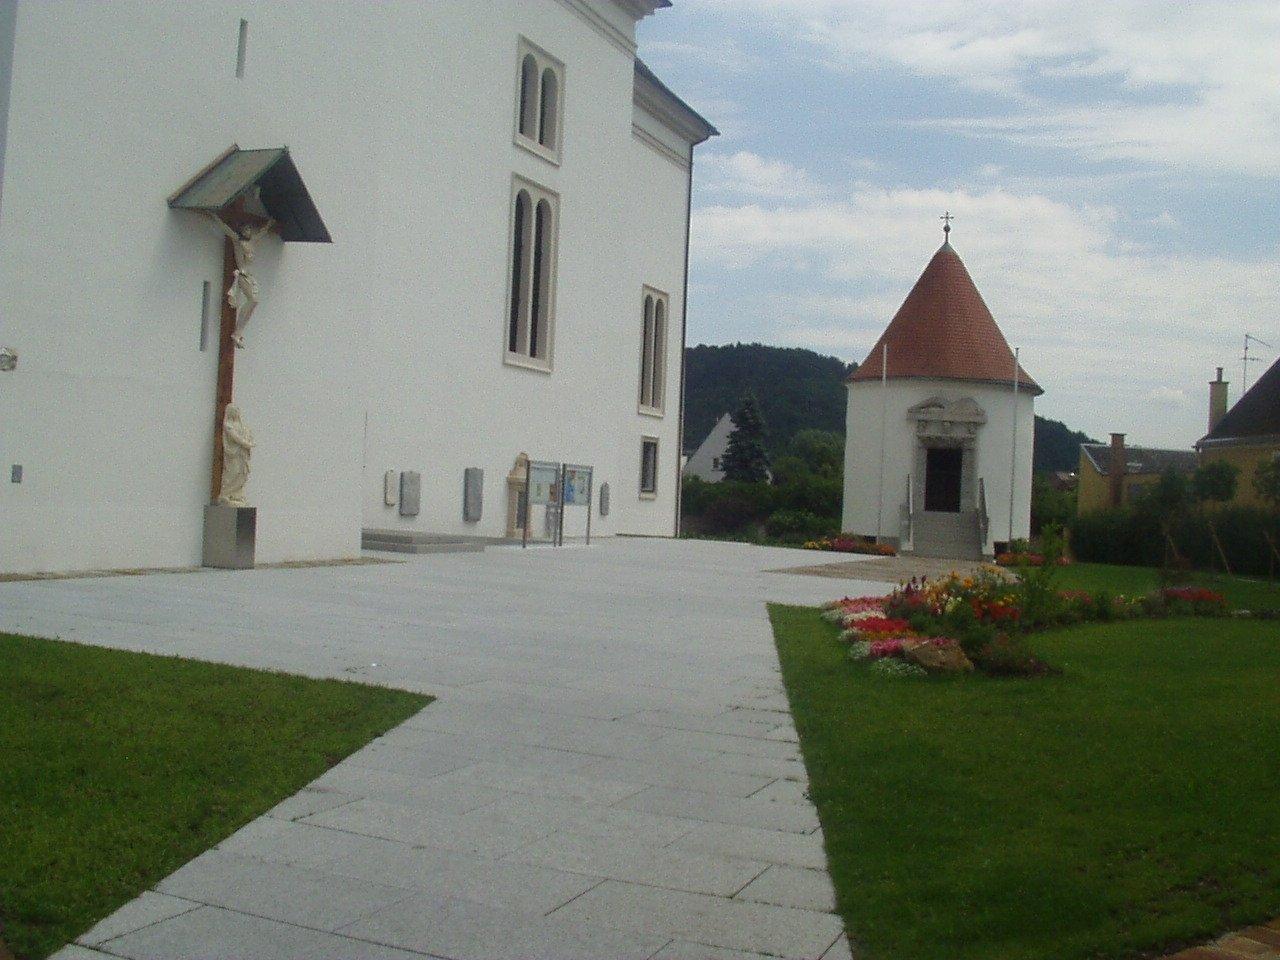 STMK - Köflach Pfarrkirche St. Margalena